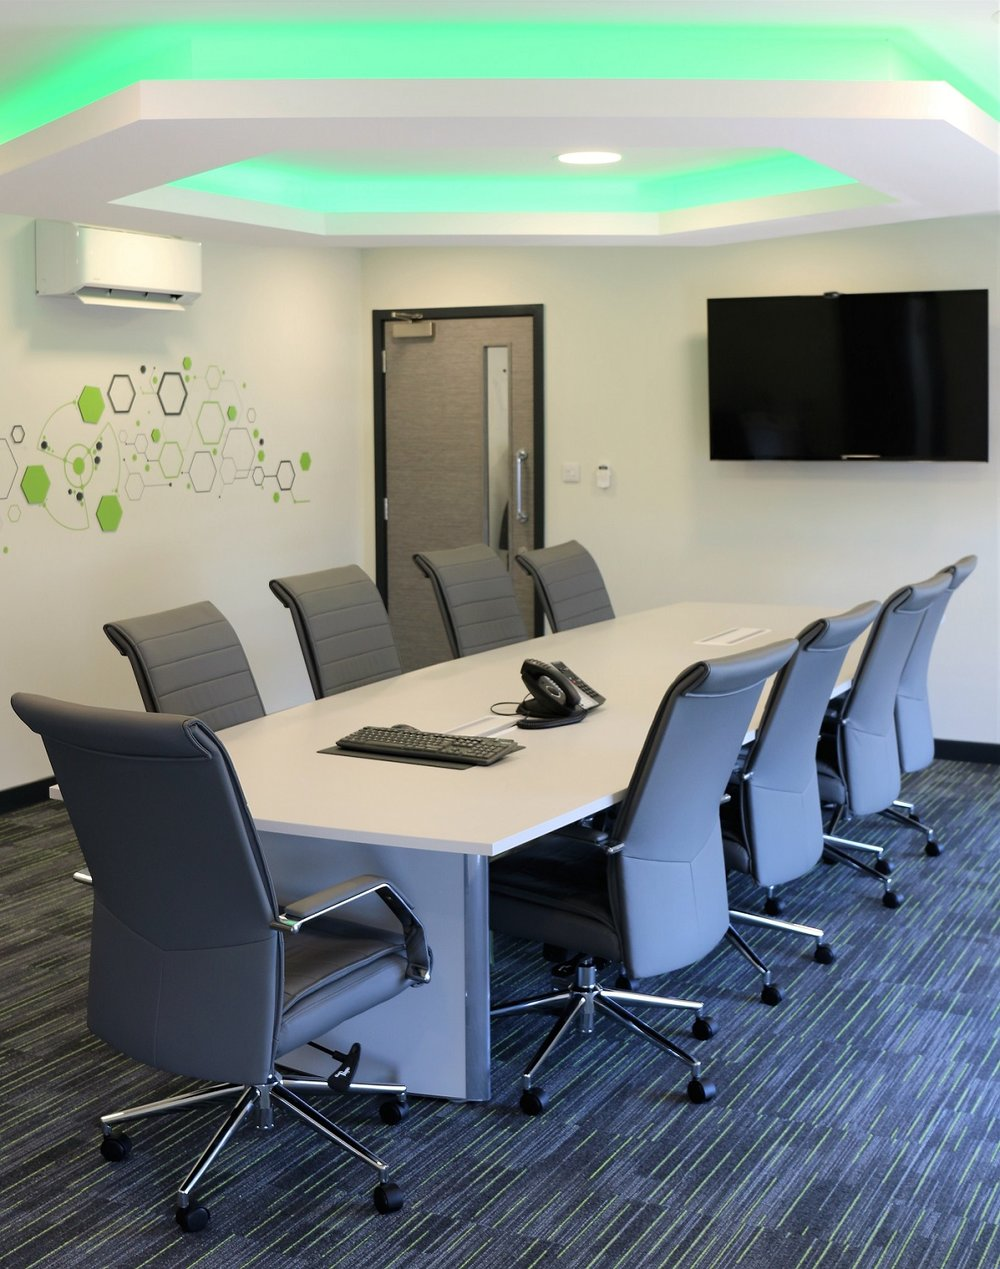 BOFA Boardroom 1.JPG